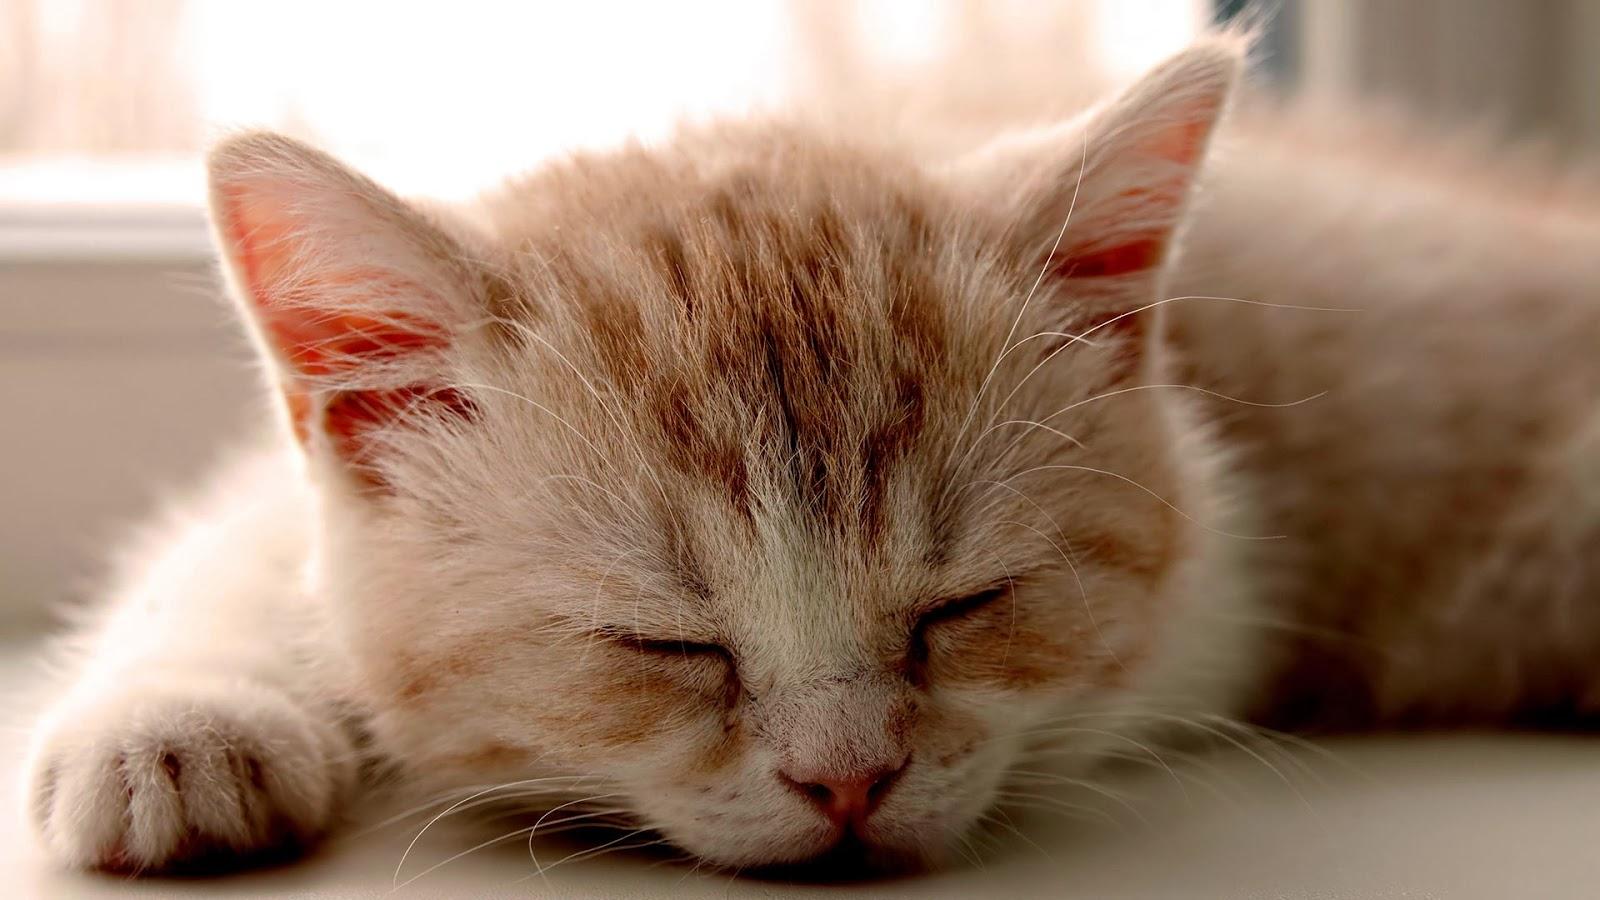 Puppy Sleeping With A Kitten Wallpaper WallDevil